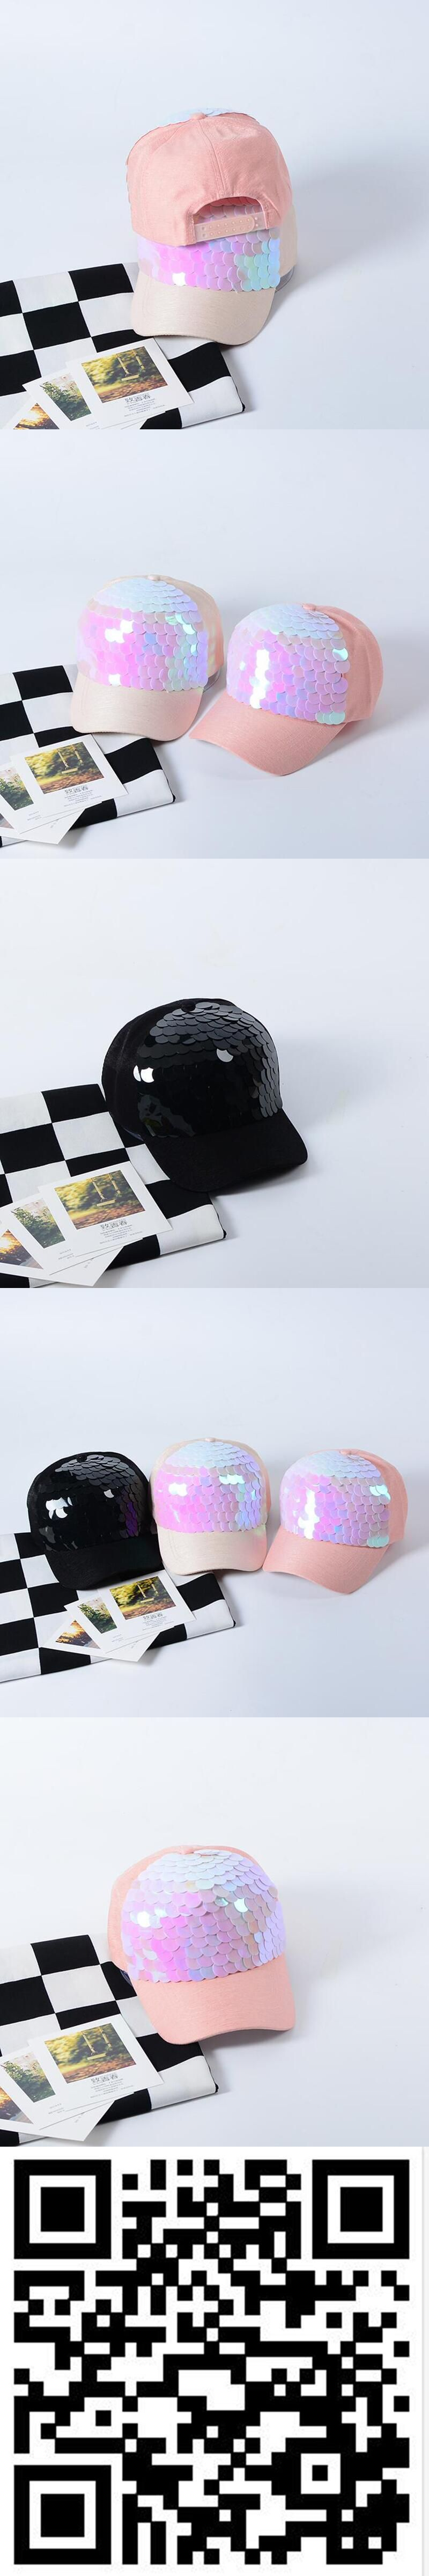 8c33b83ae01 2017 new Women Baseball Cap Bling Fish Scales Sequins Hip Hop Cap Vintage  Snap Back Design